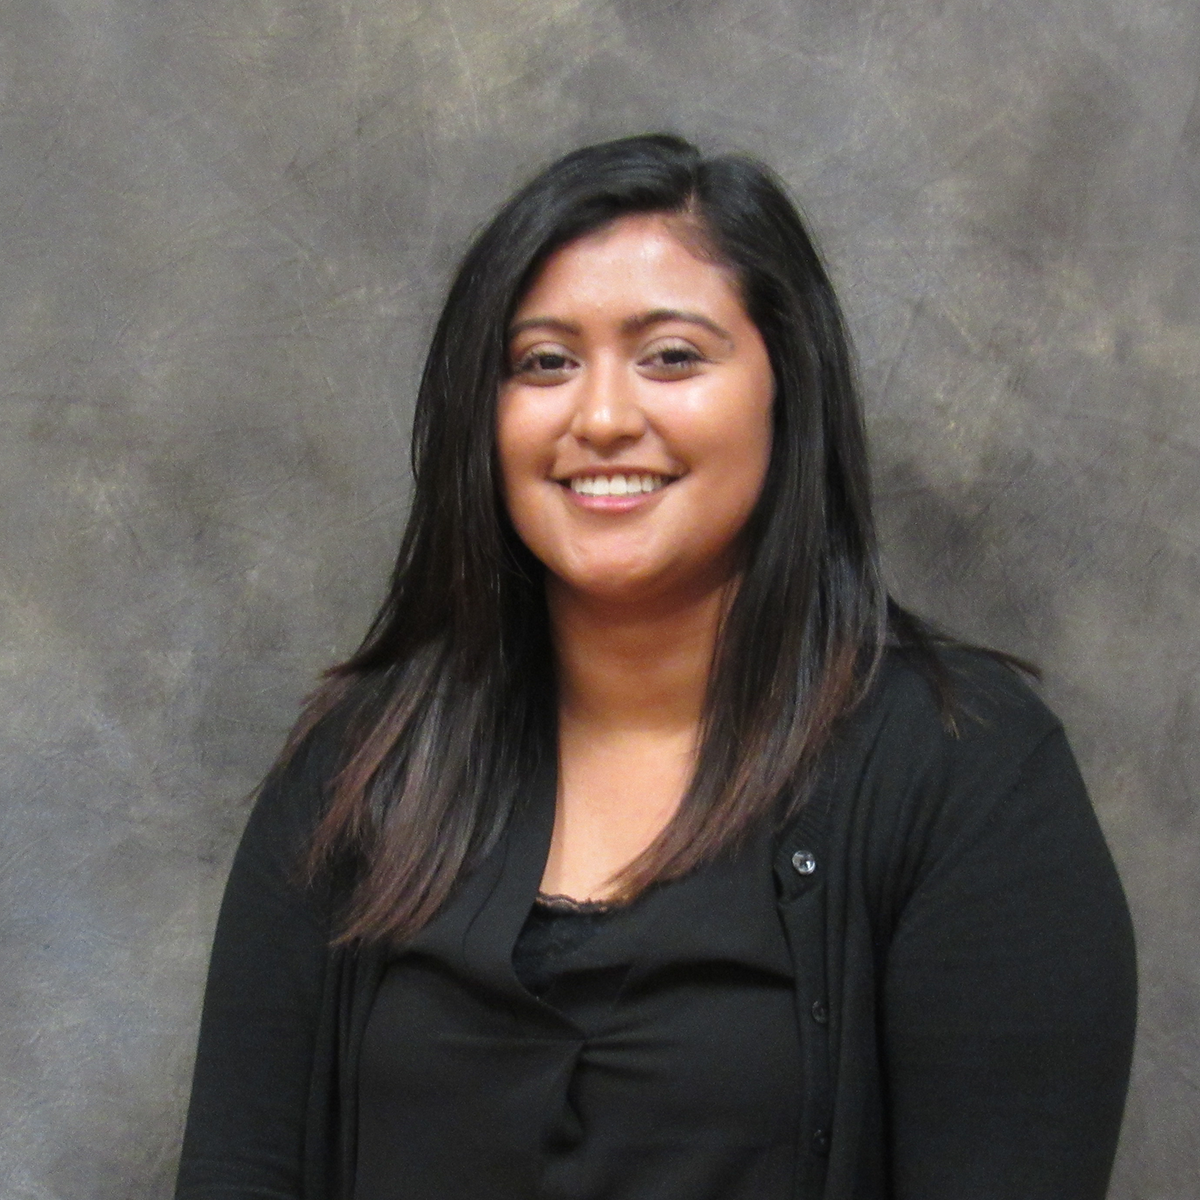 Angelica Reyes-Housing Technician